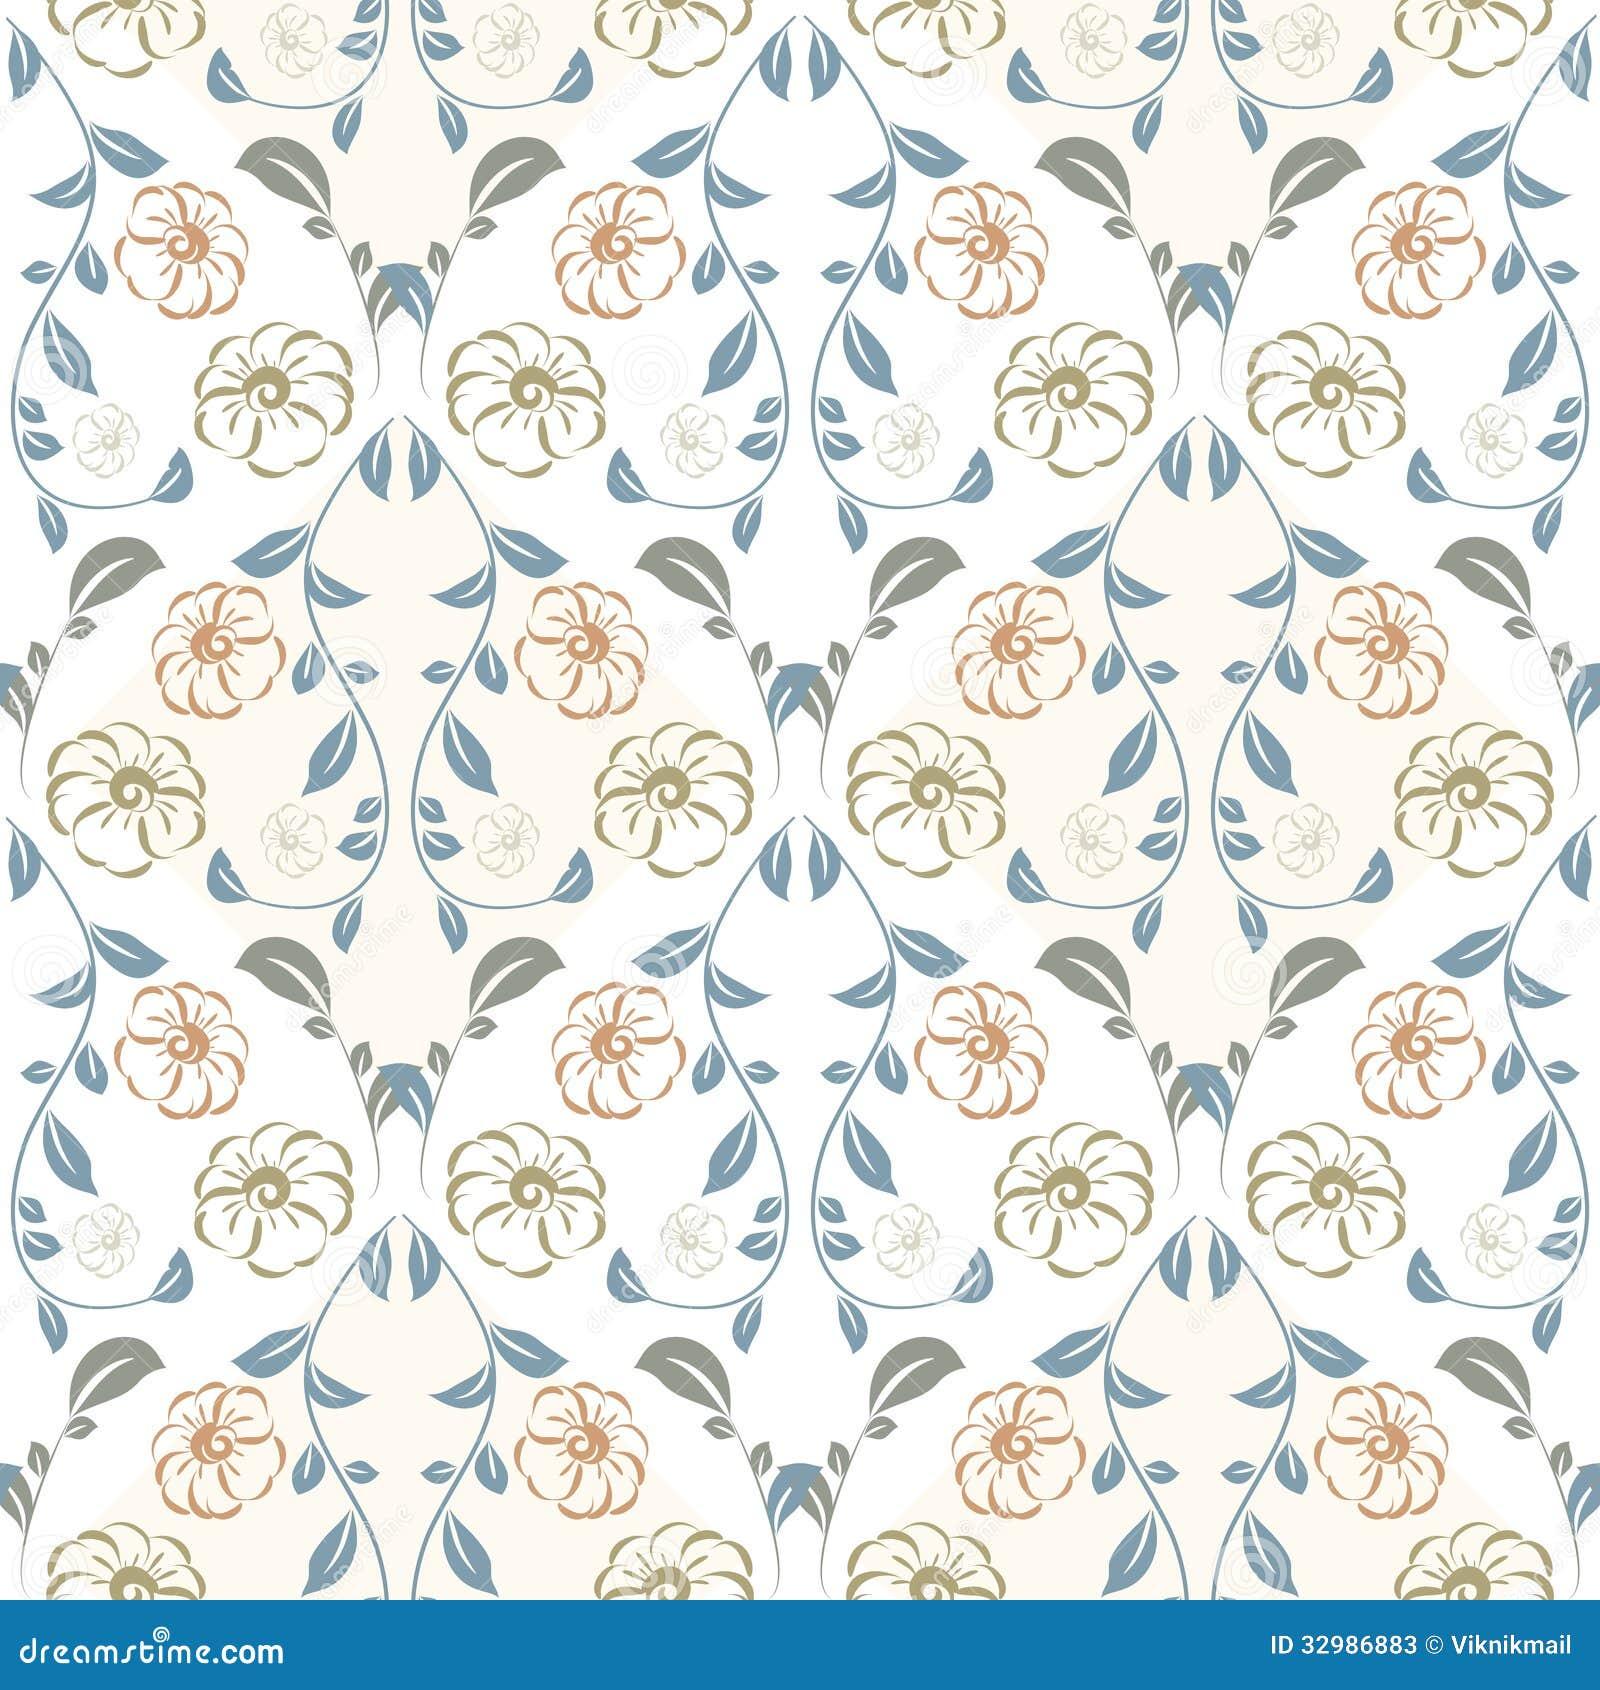 Vintage pastel pattern - photo#32